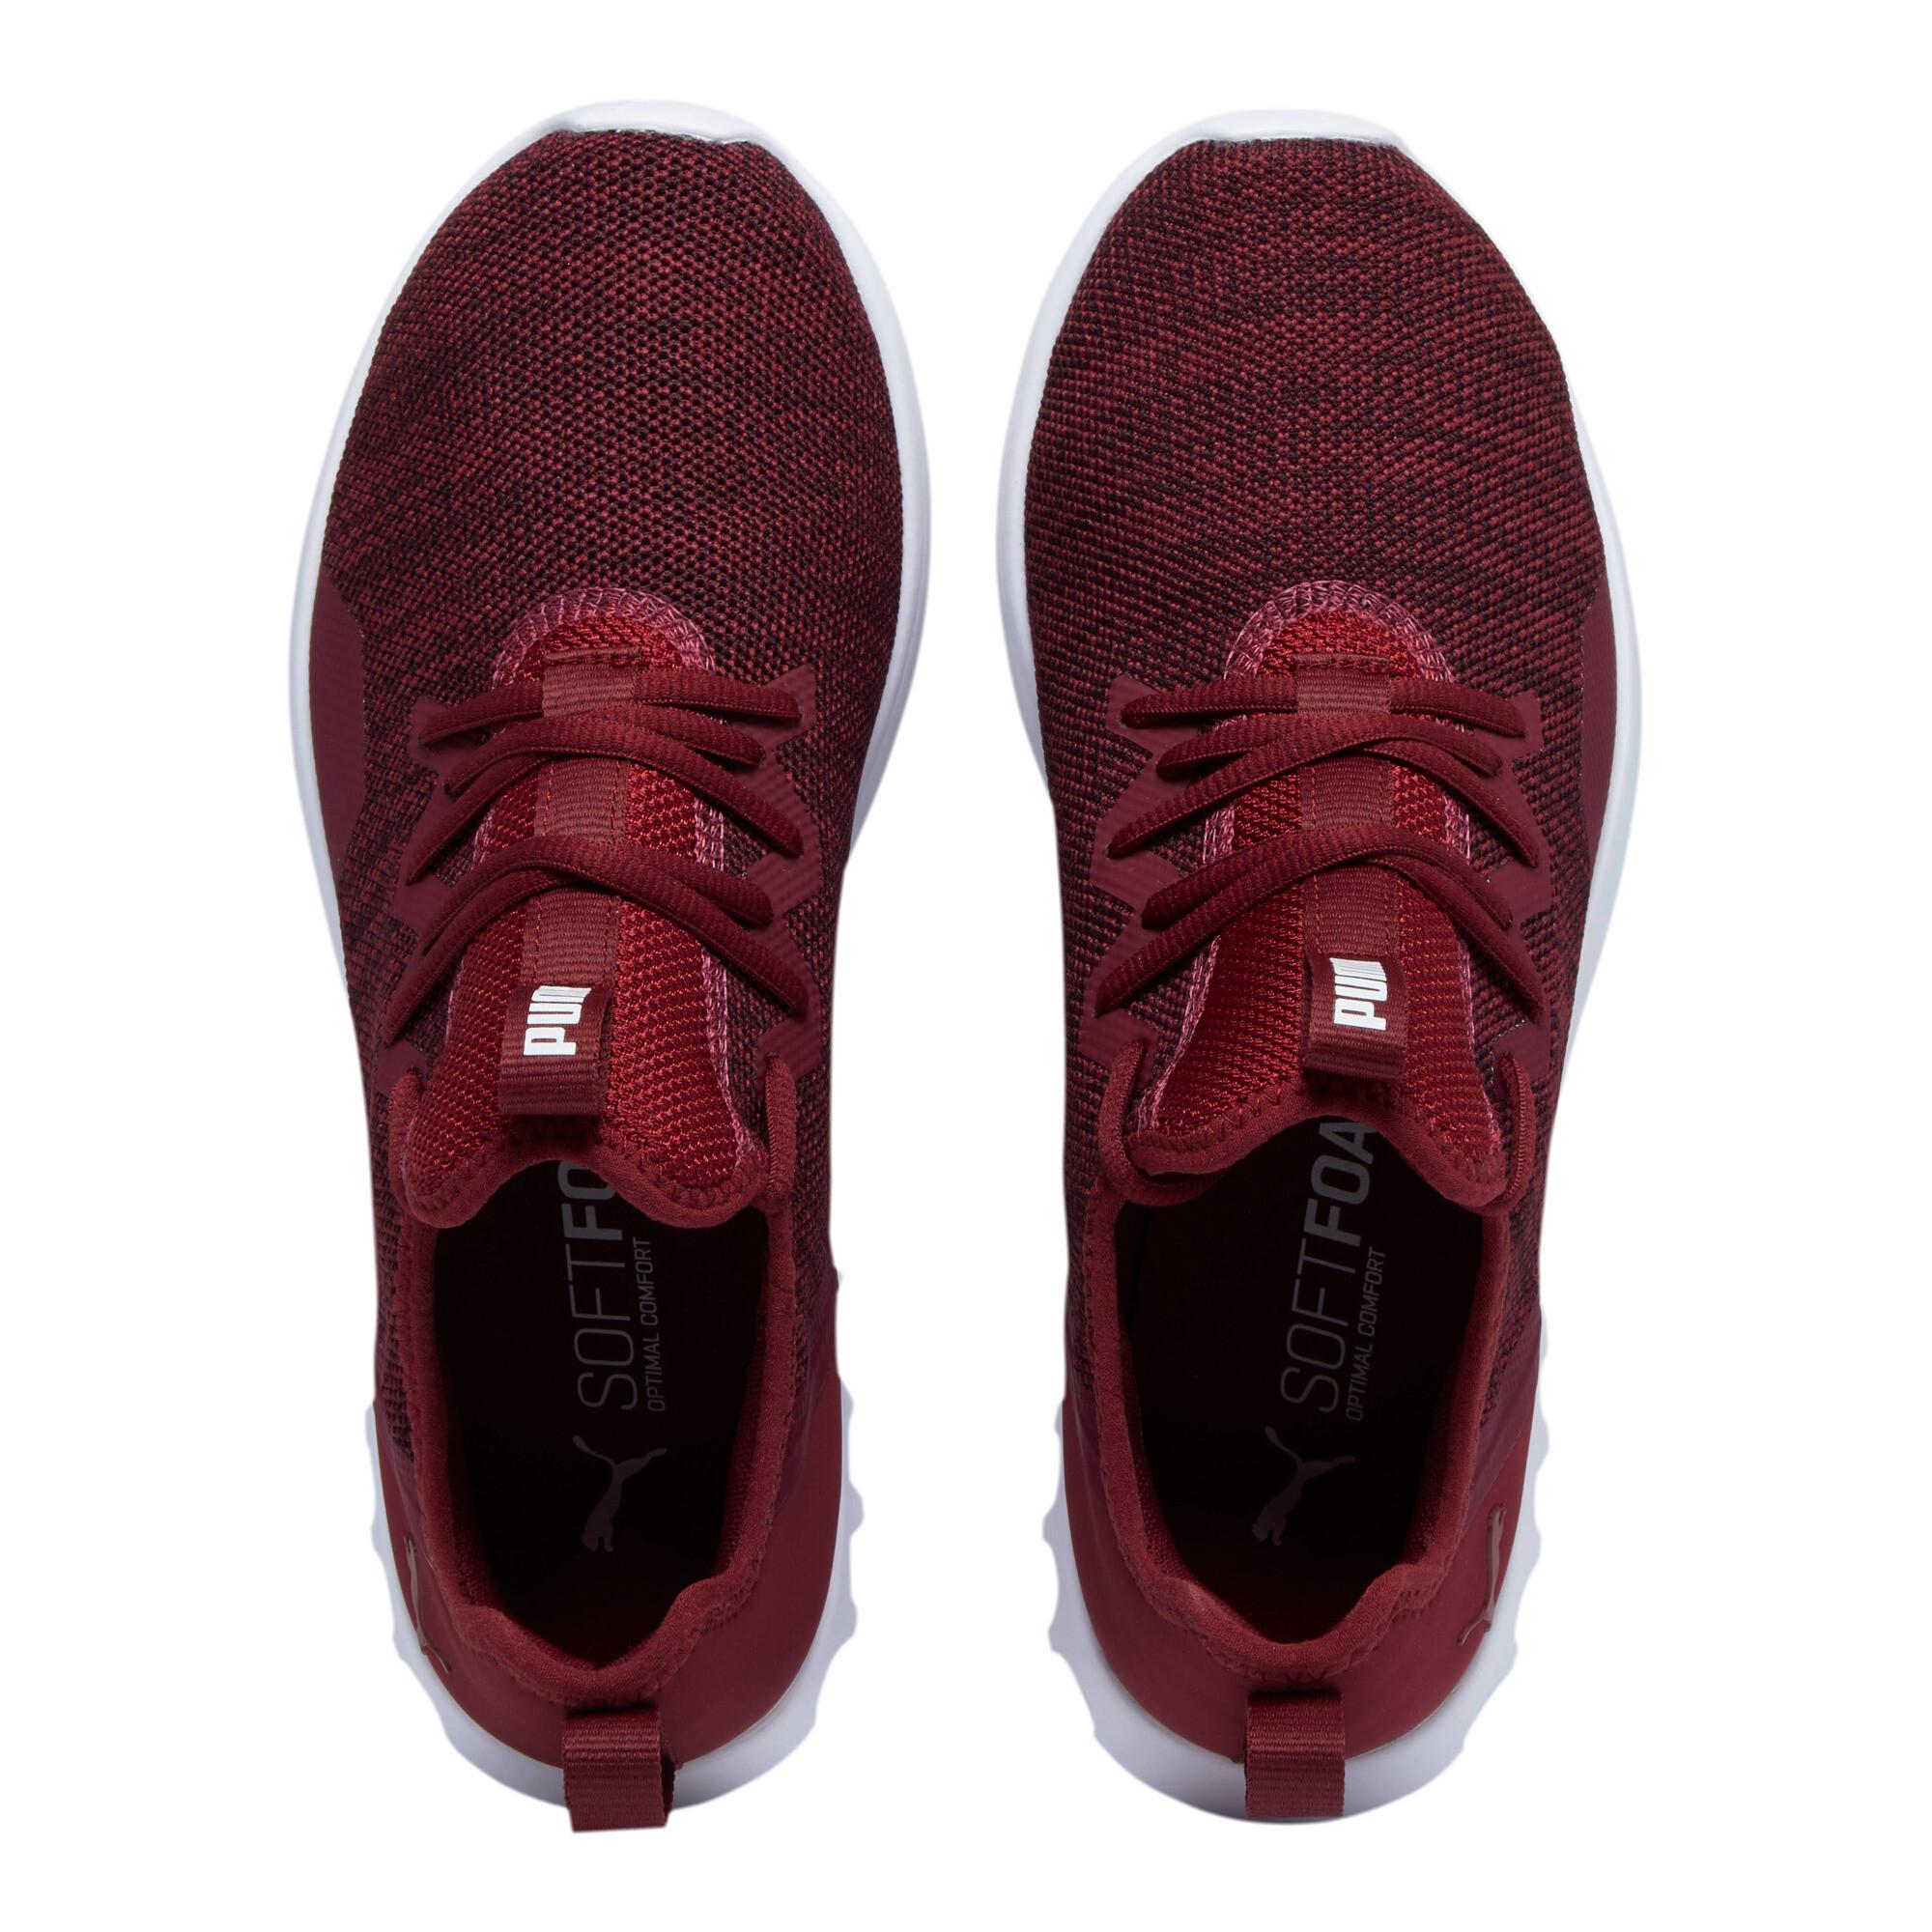 PUMA-Men-039-s-Carson-2-X-Knit-Running-Shoes thumbnail 43